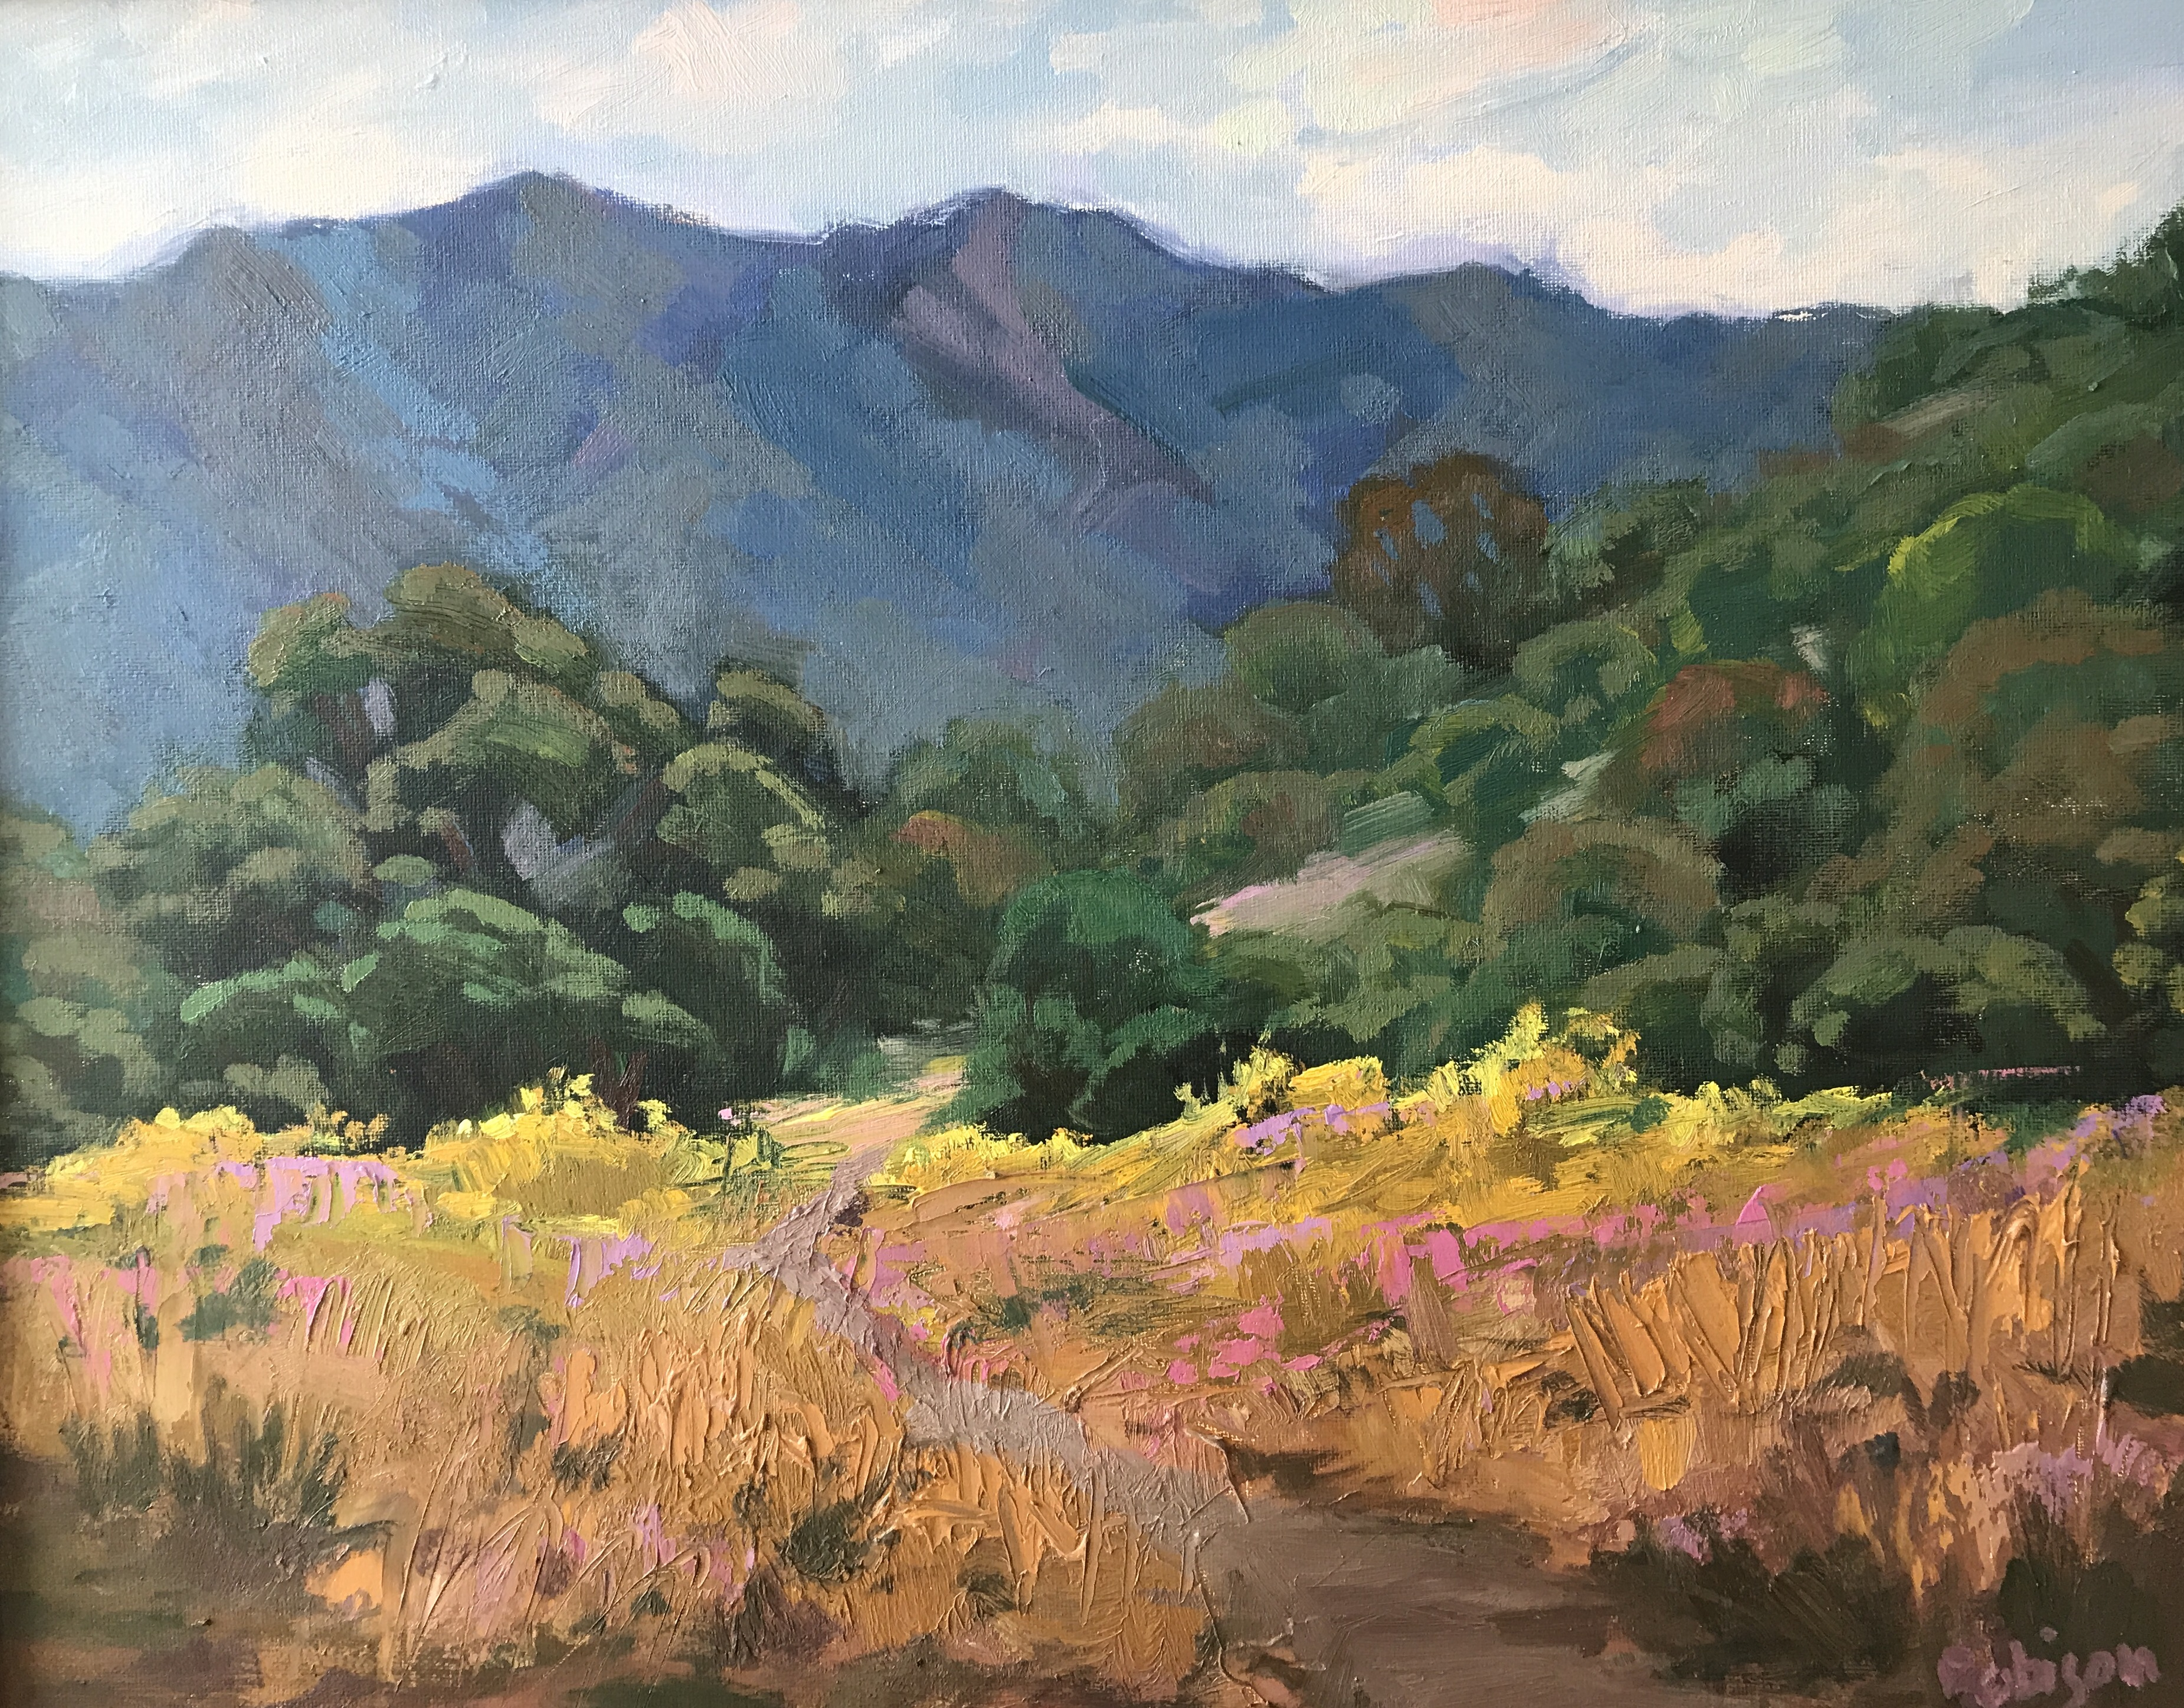 Fall Wallpaper Ocean Original Landscape Oil Paintings By Kathleen M Robison